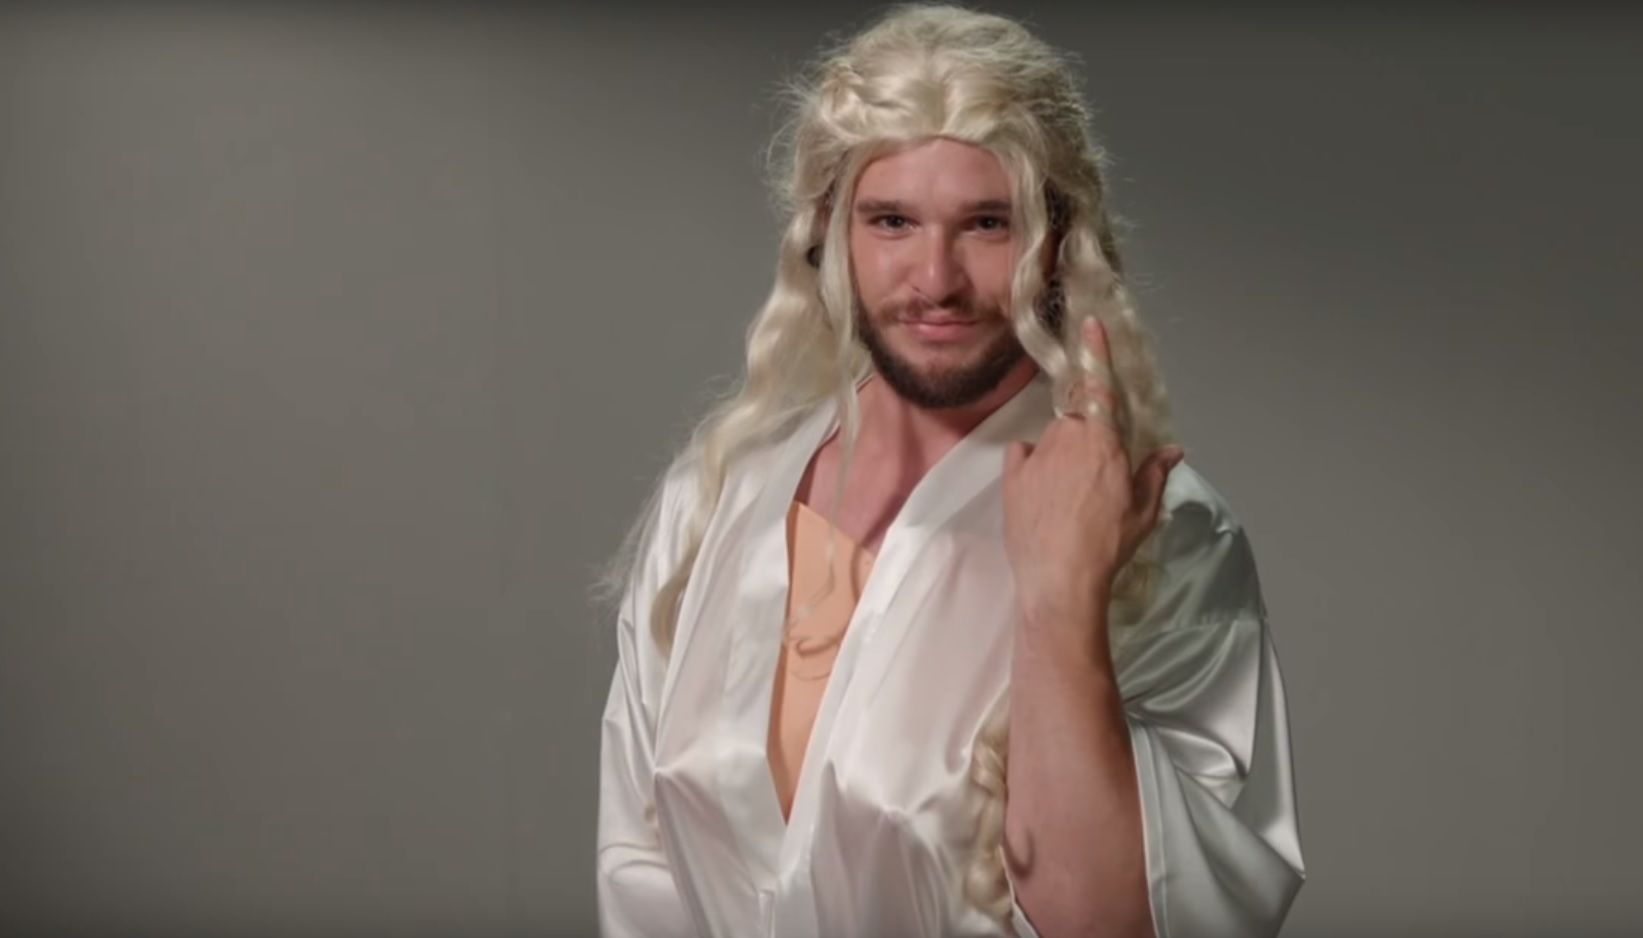 Daenerys Targaryen Is Favoured To Win Game Of Thrones